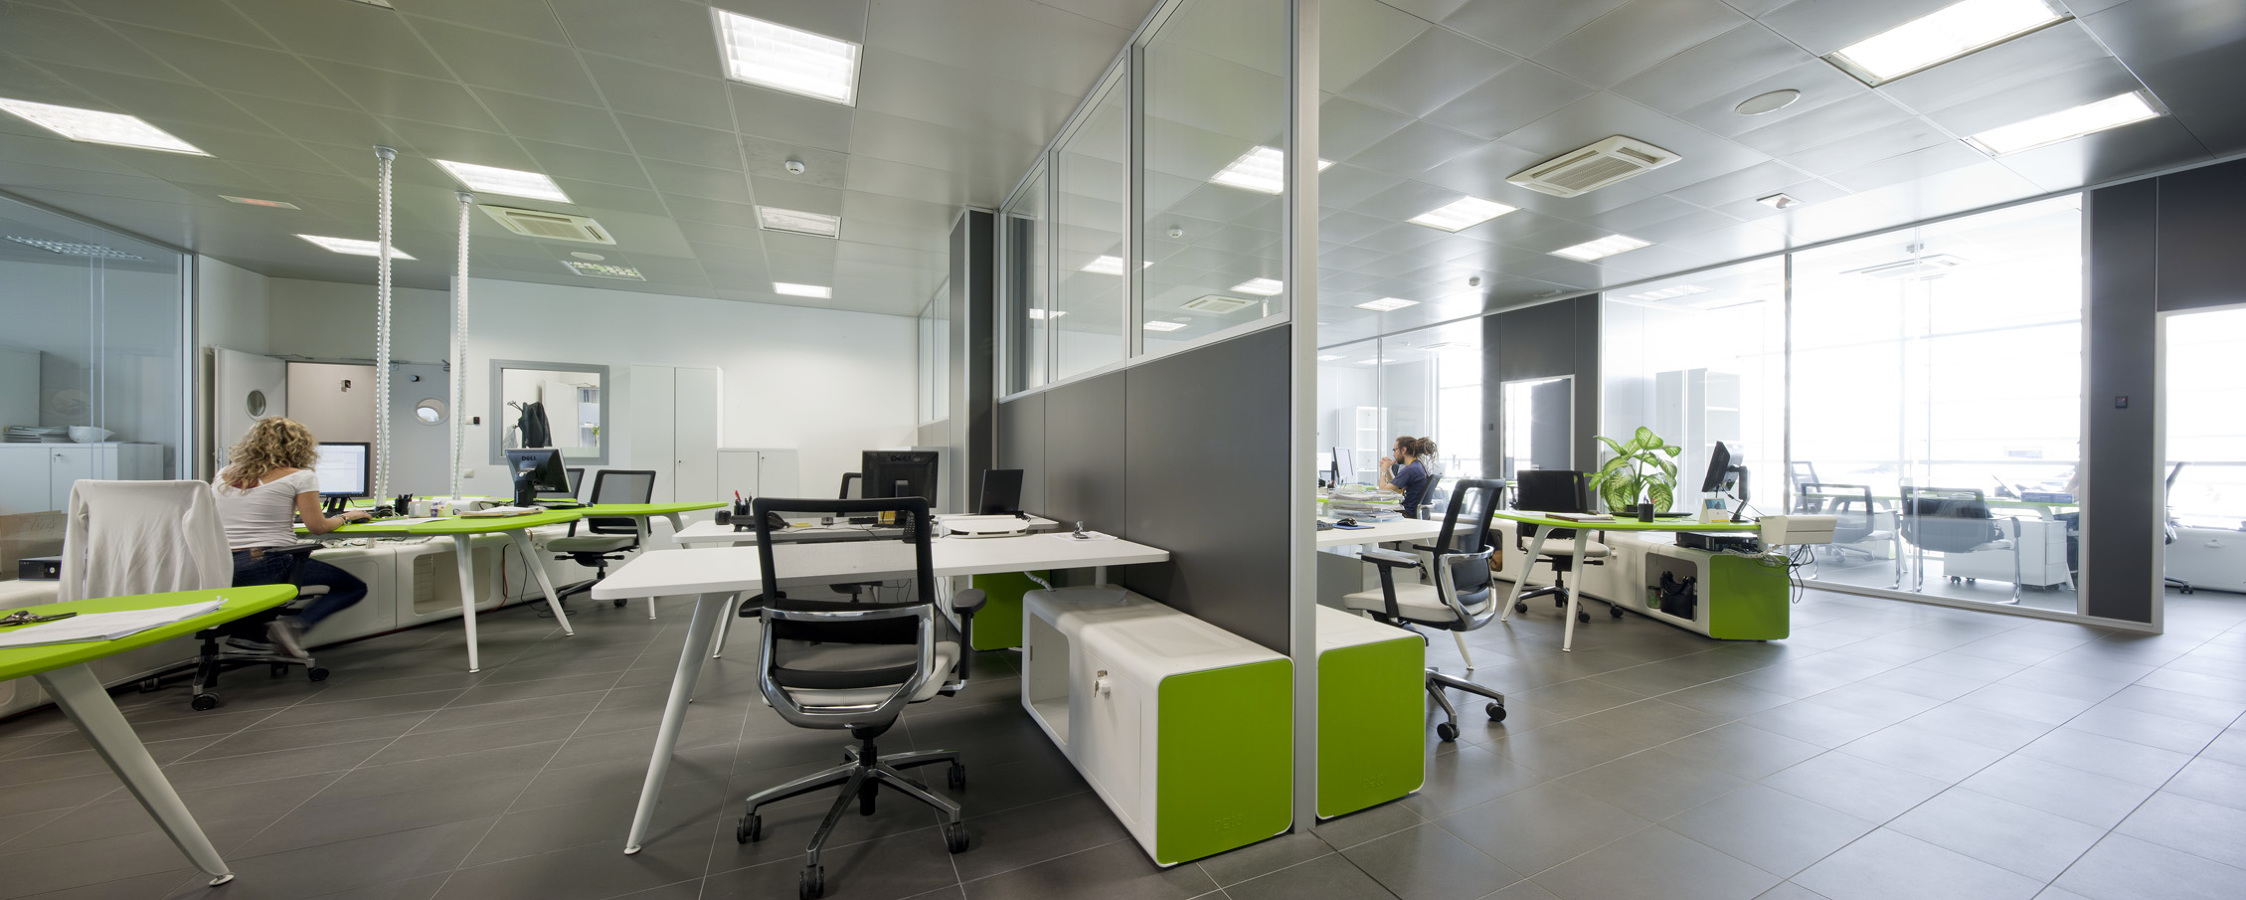 Foto proyecto imdea energia de espacio aretha 242640 for Oficina de empleo segovia